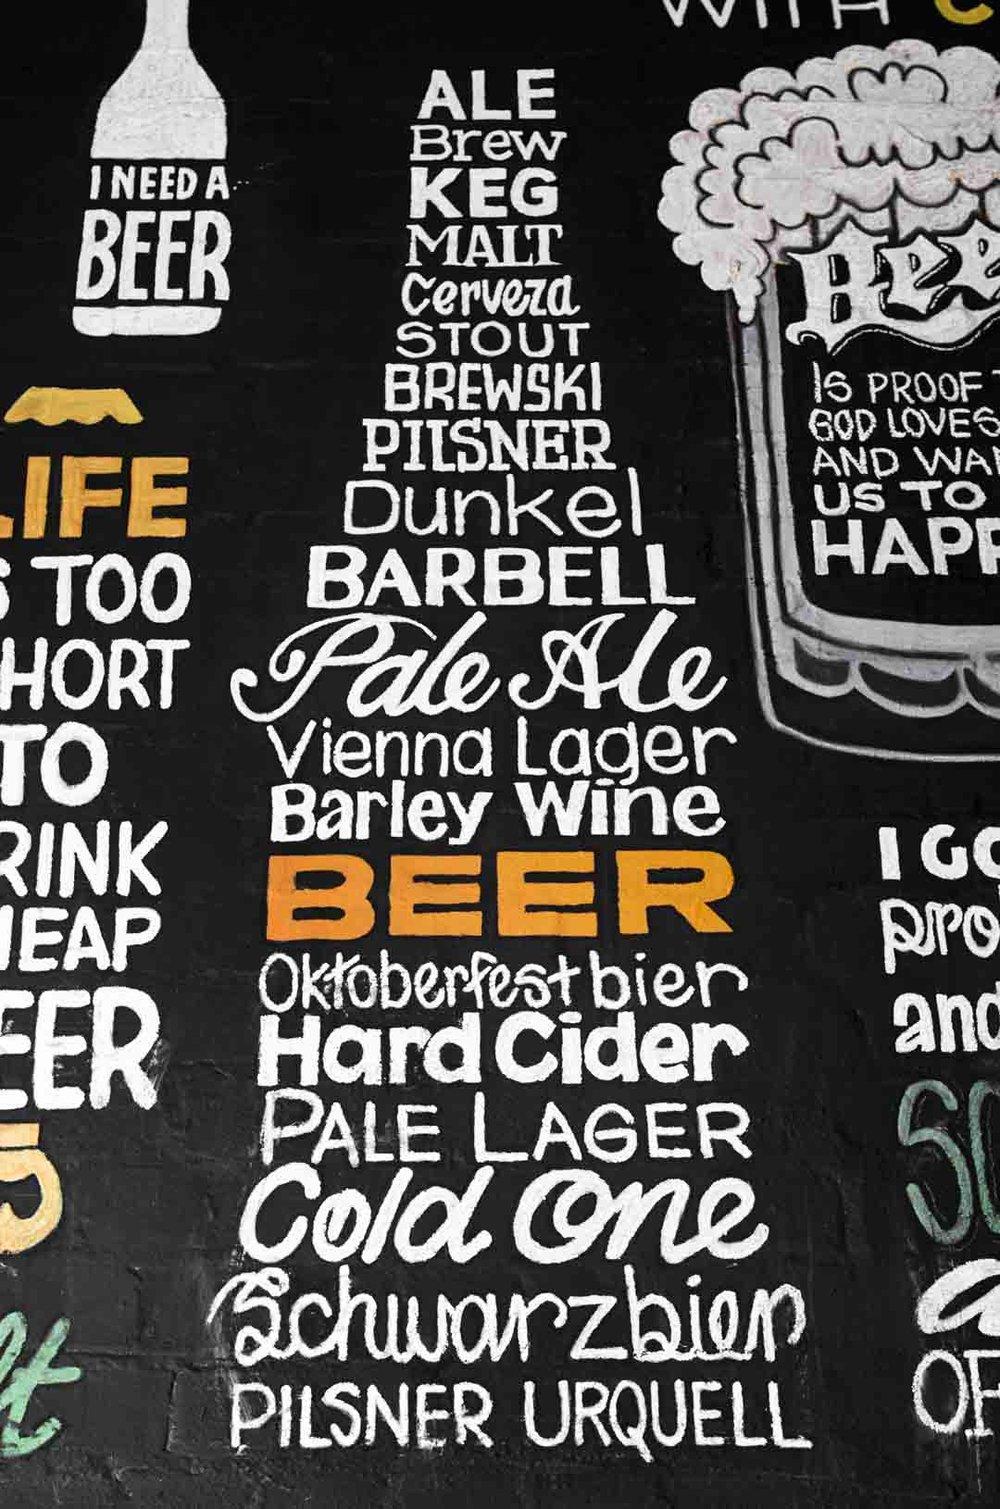 The-Mash-Tun---Beer-Styles-Chalk.jpg